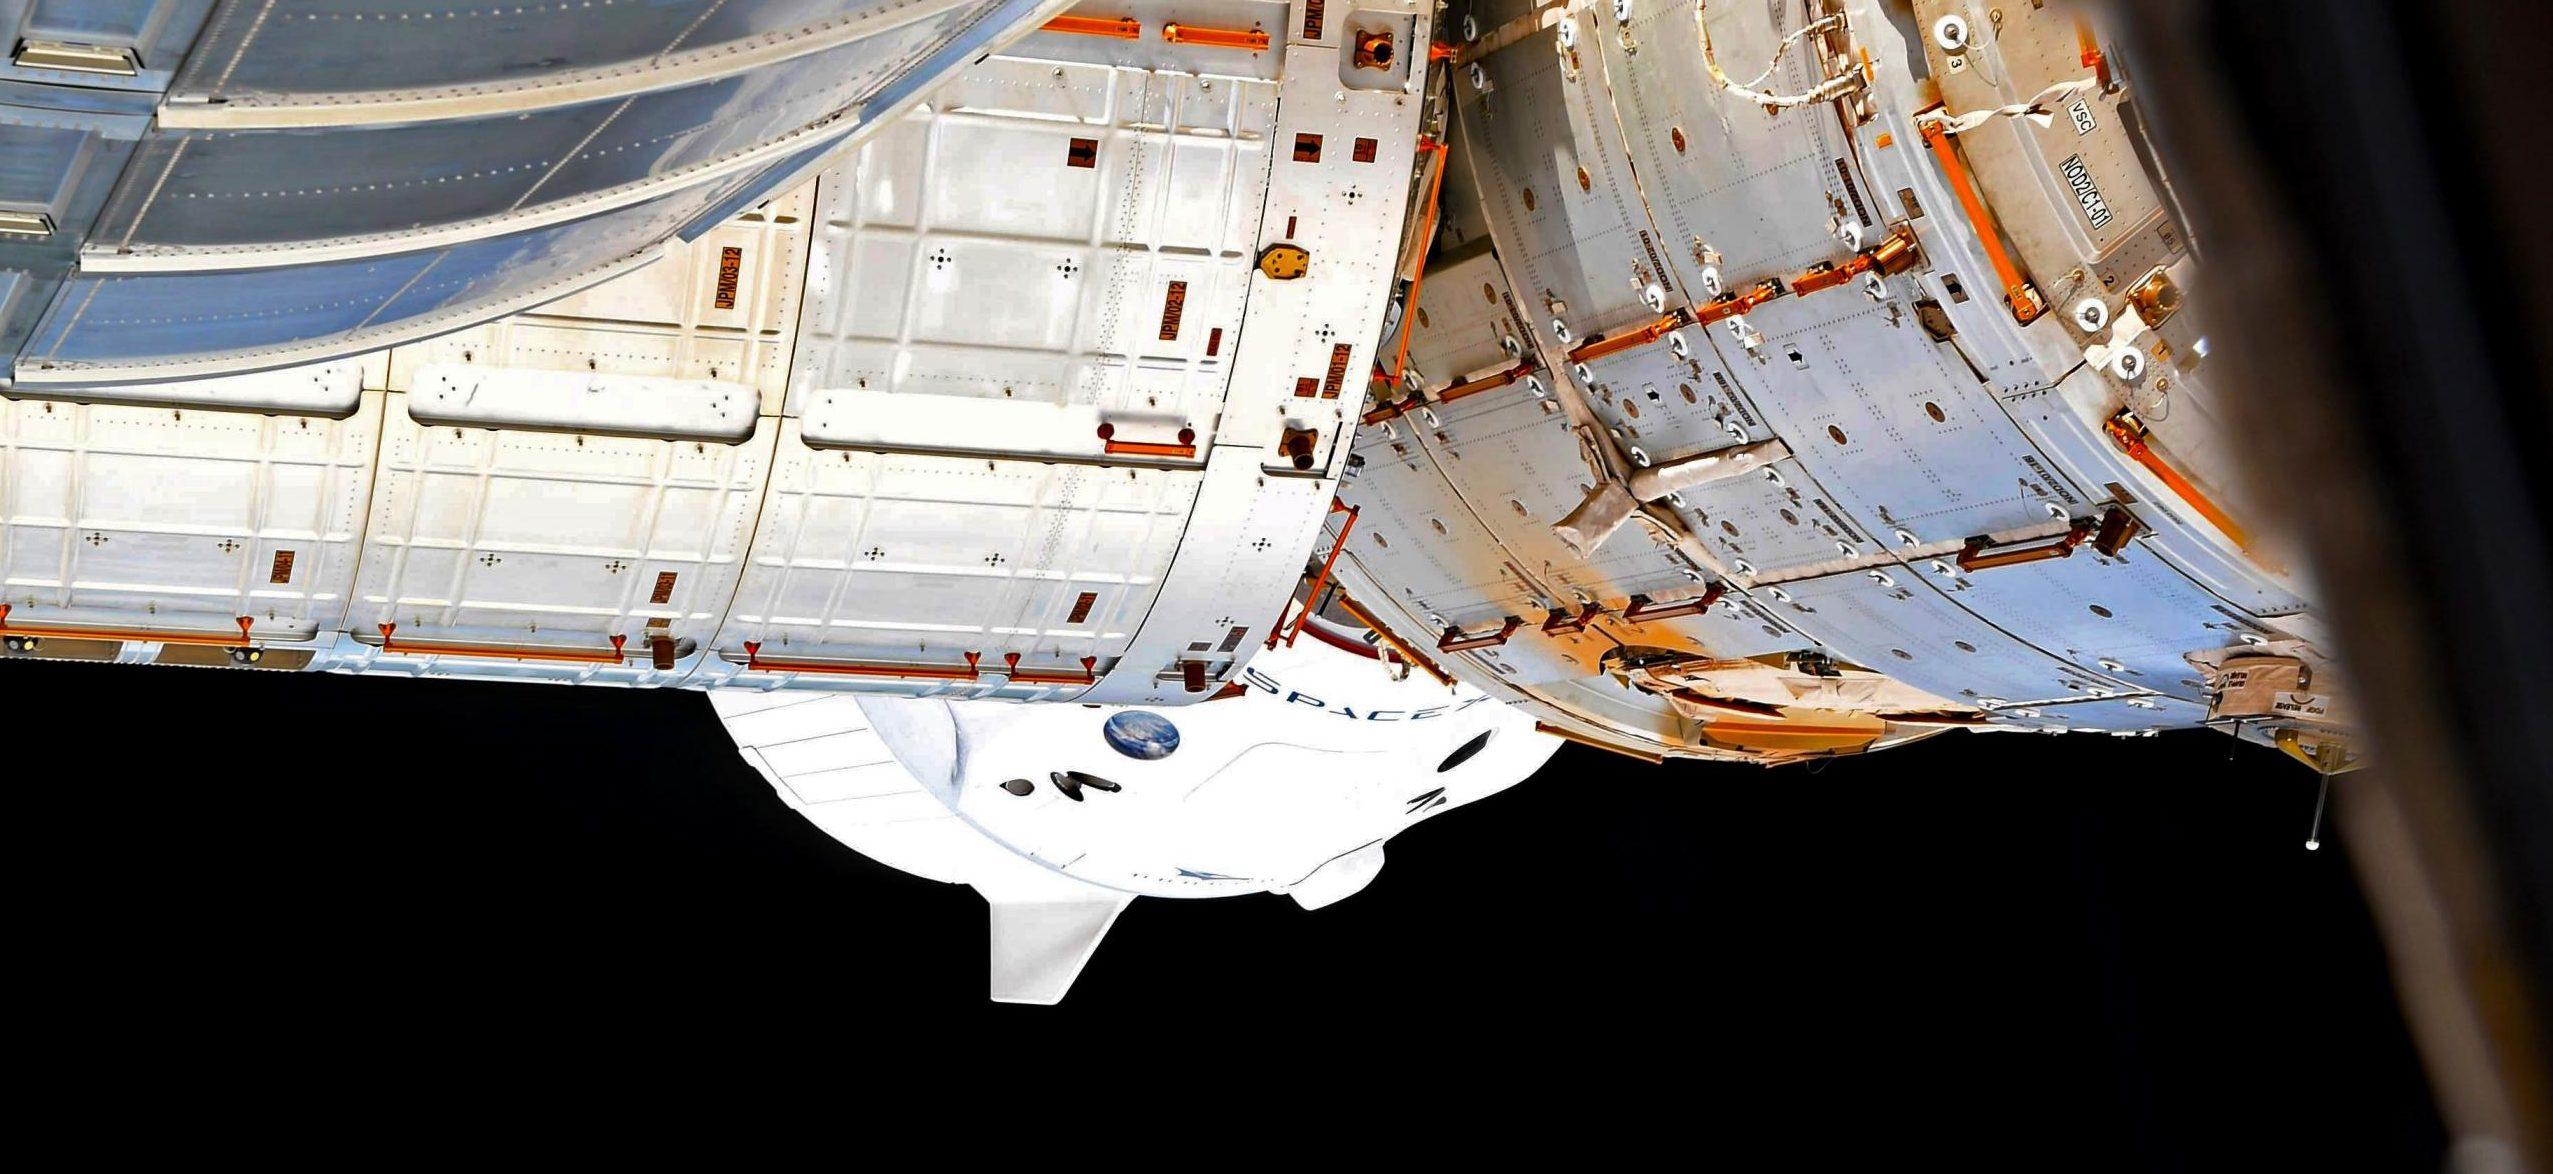 Crew Dragon Crew-1 ISS ops 111620 (Sergey Kud-Sverchkov) docked 1 crop (c)